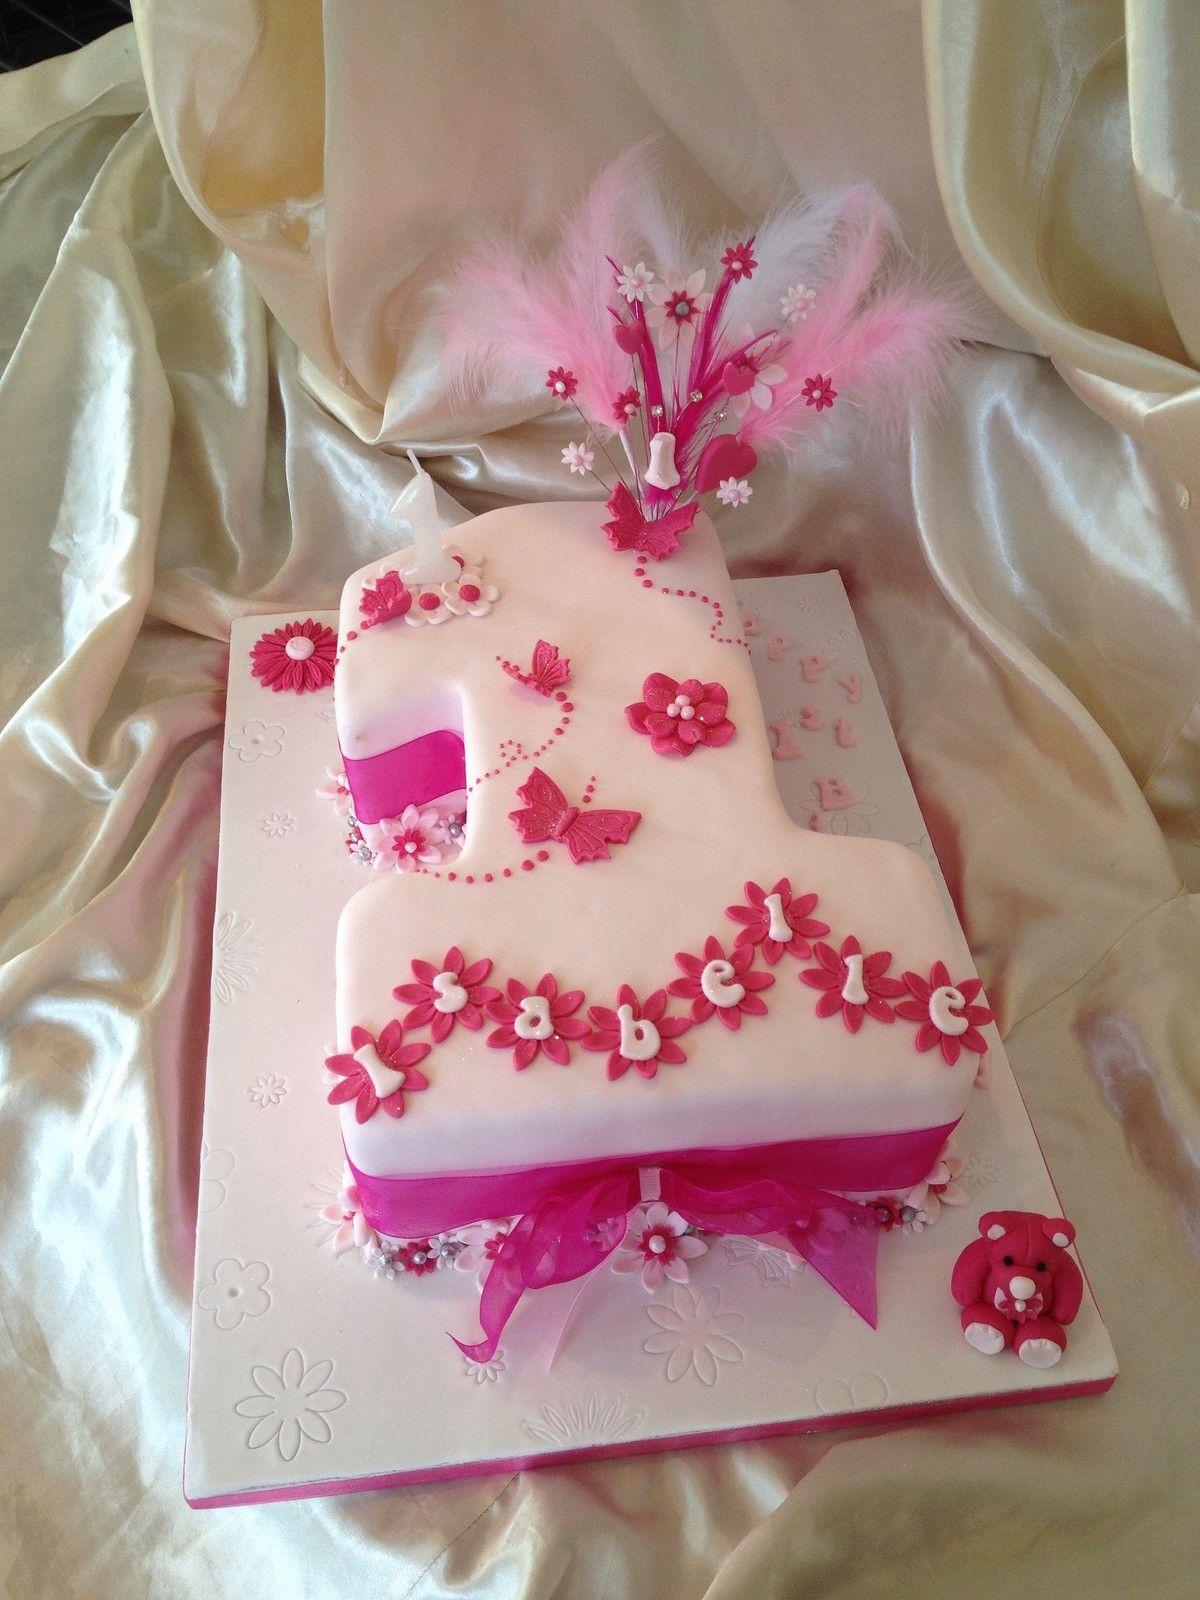 Baby girl 1st birthday cake pictures mattie bentley